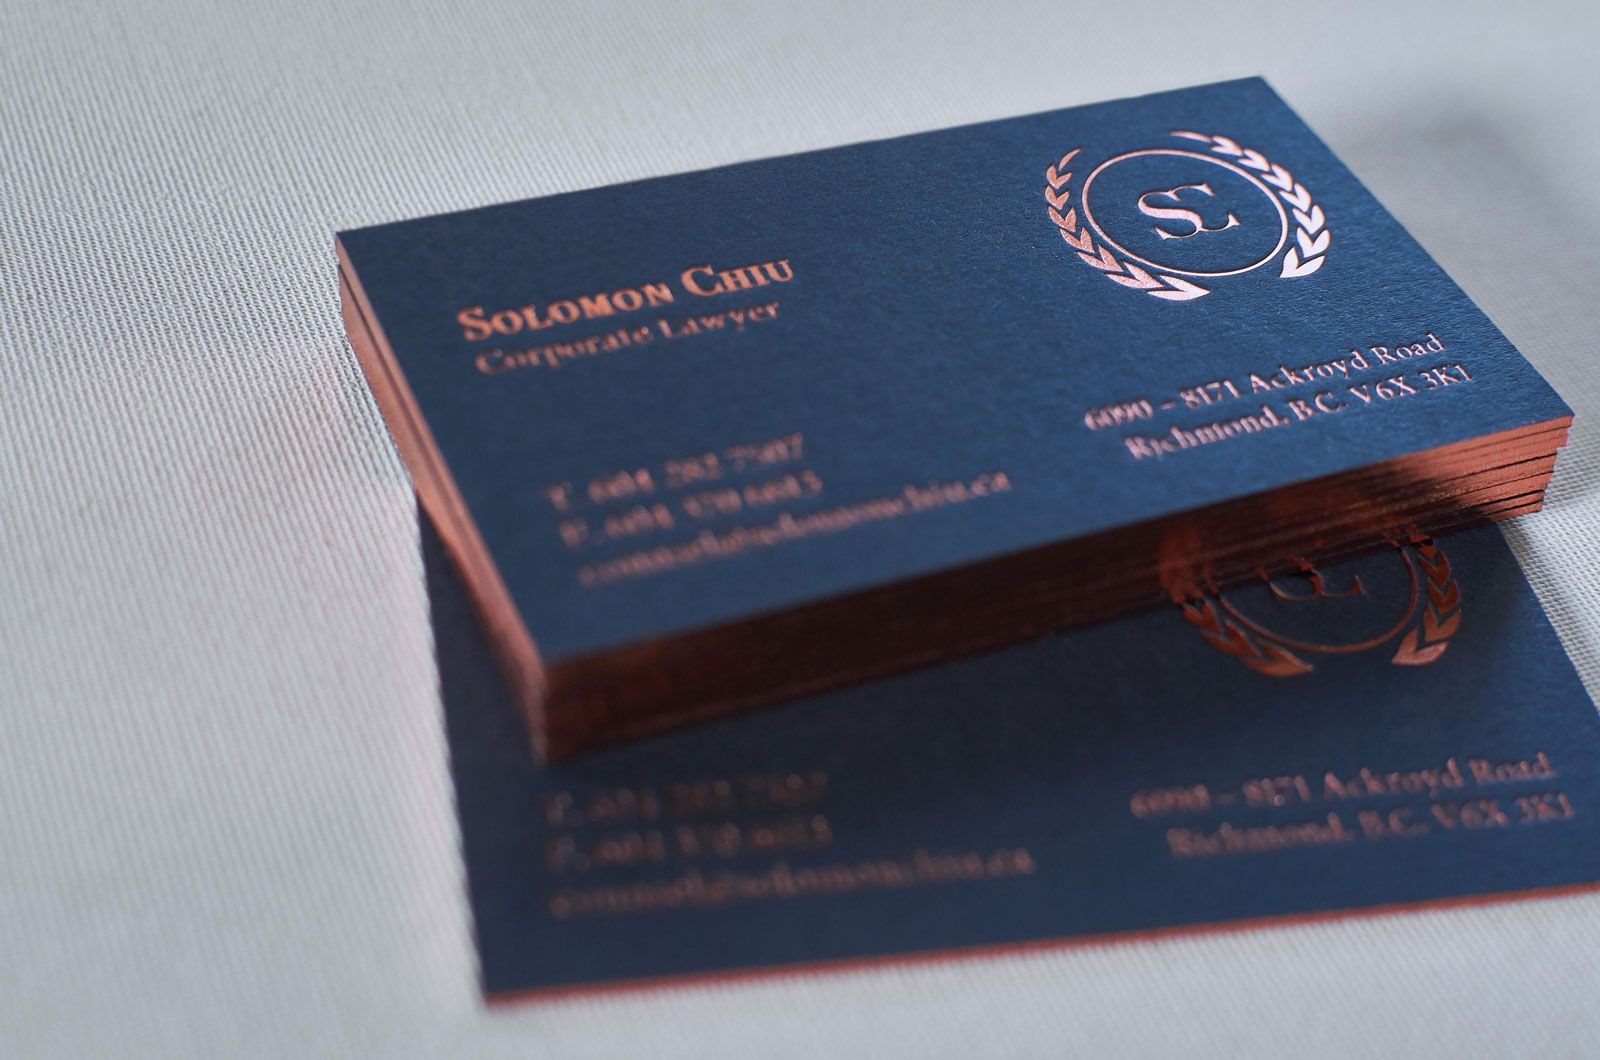 Letterpress Business Cards Elegante Press Letterpress Business Cards Luxury Business Cards Business Card Graphic